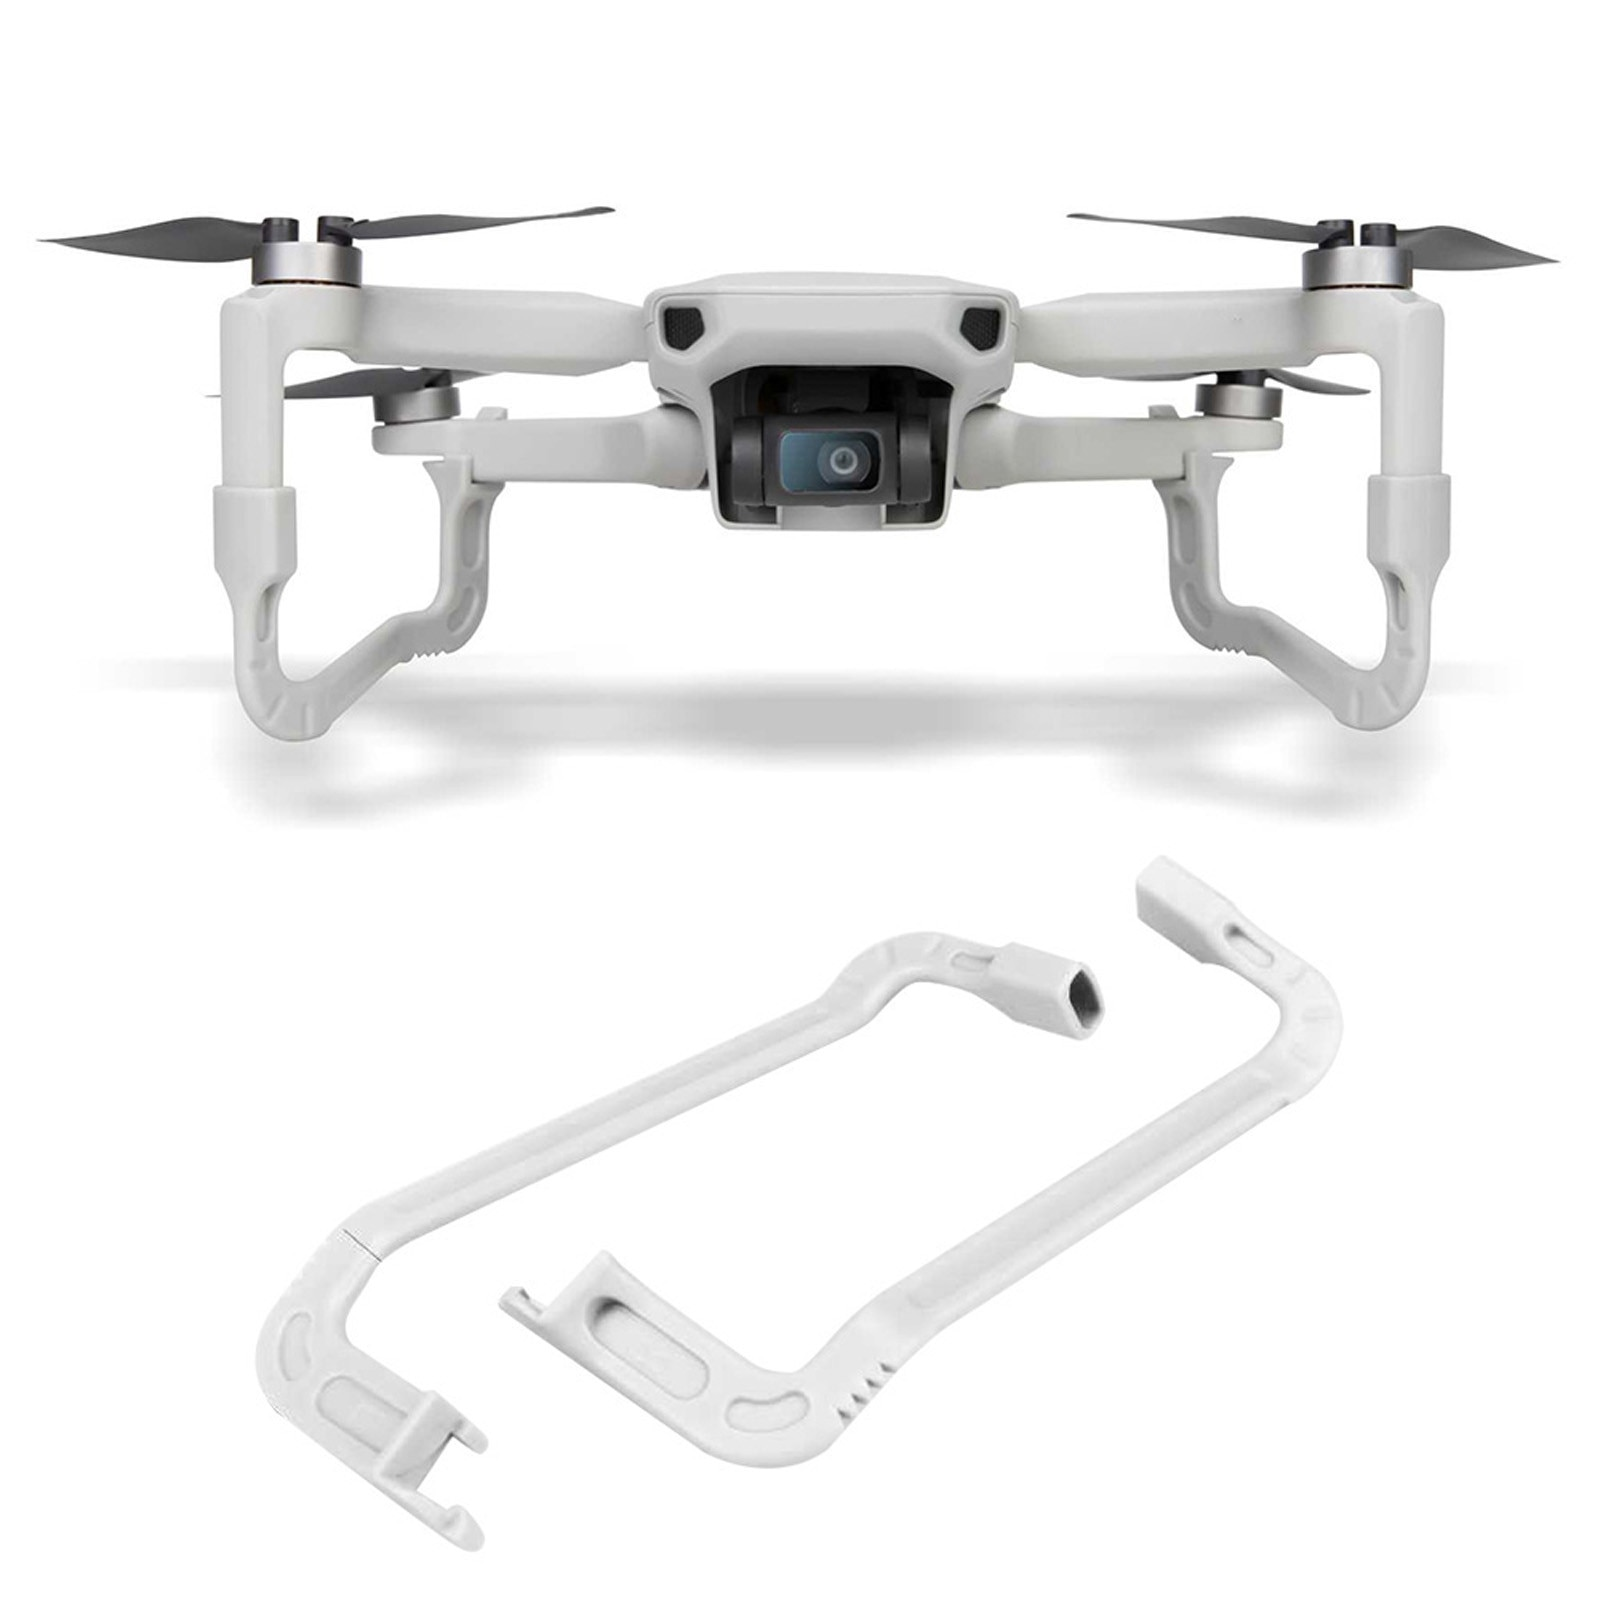 juguetes-para-ninos-extensiones-de-equipo-de-aterrizaje-extensor-de-altura-de-pierna-protector-para-dji-mavic-mini-2-dron-zabawki-dla-dzireci-k4